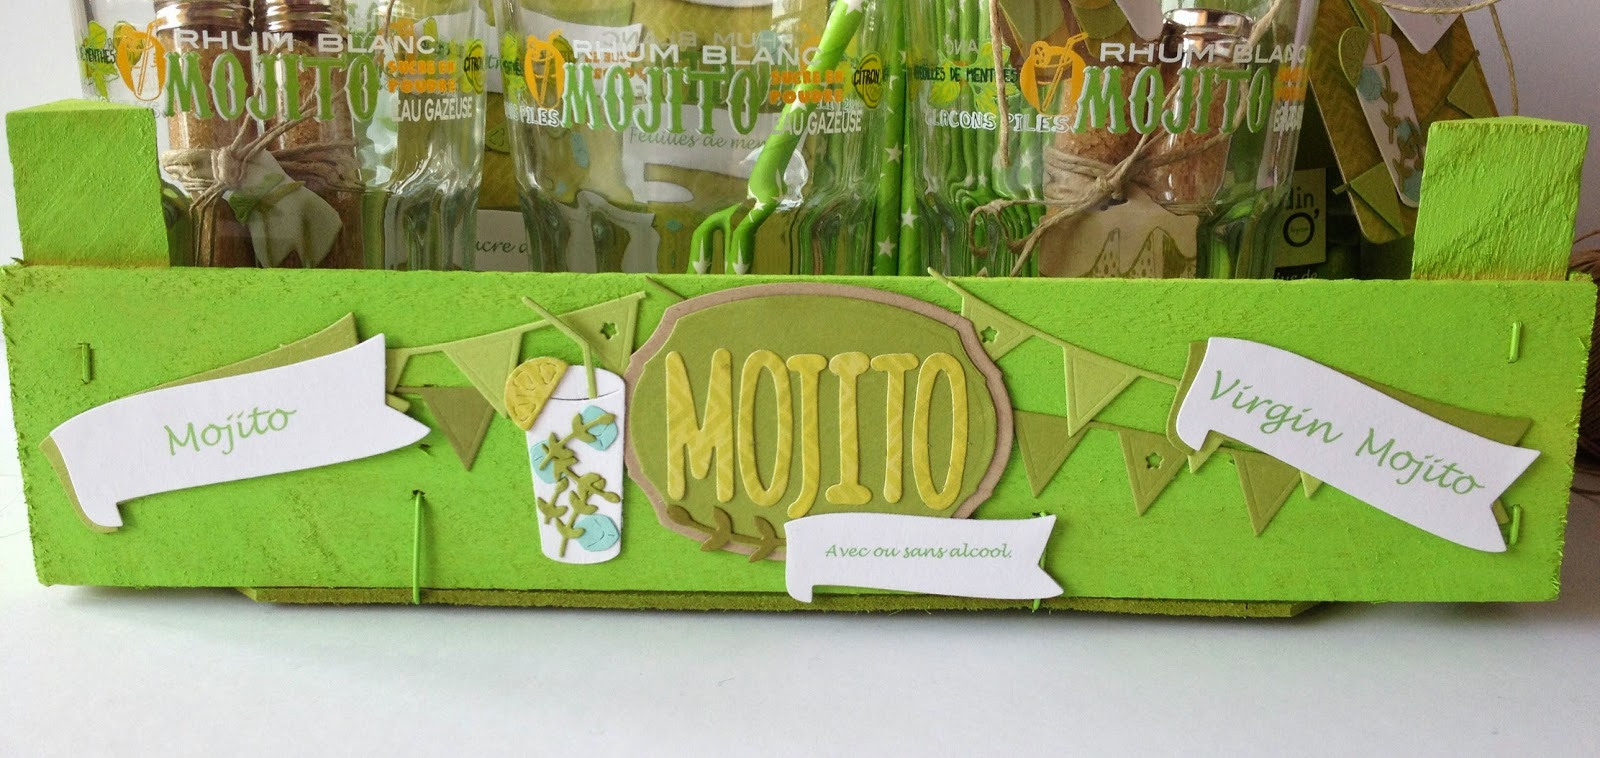 Populaire Feebellescrap: Inspiration 4enscrap/ensemble cadeau Mojito! PR81